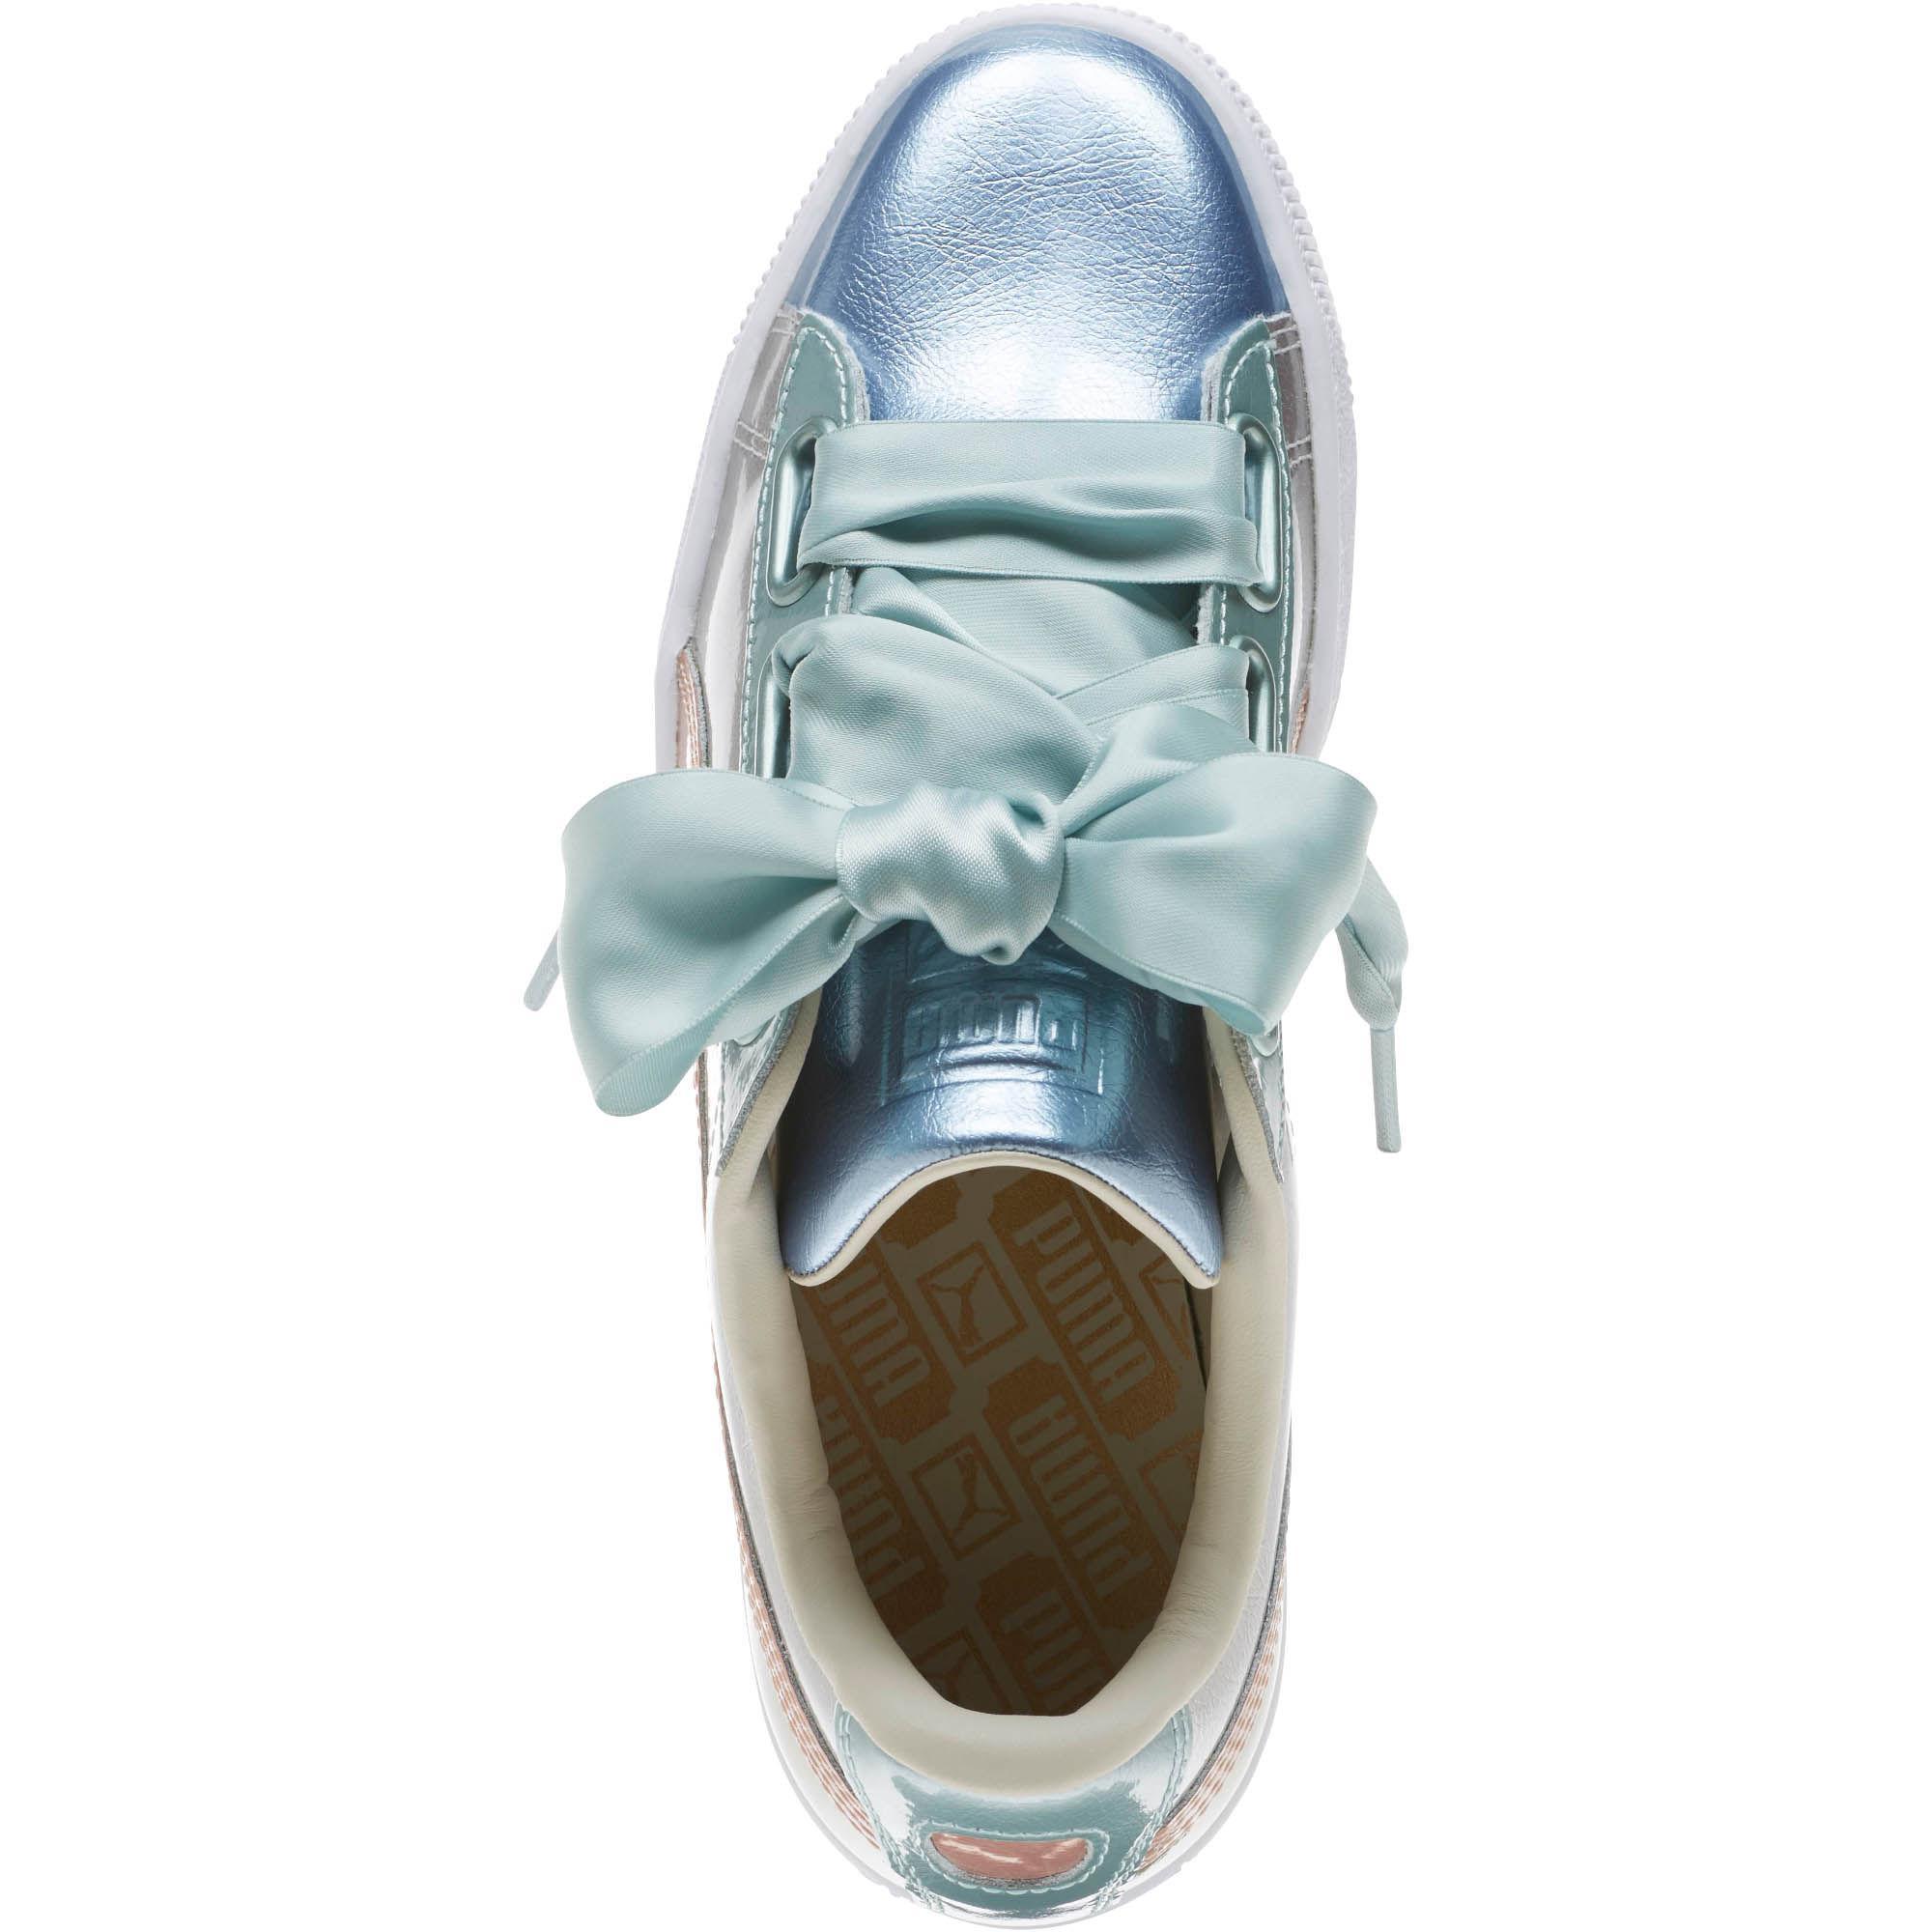 wholesale dealer b2870 e820f PUMA Metallic Basket Heart Bauble Women's Sneakers